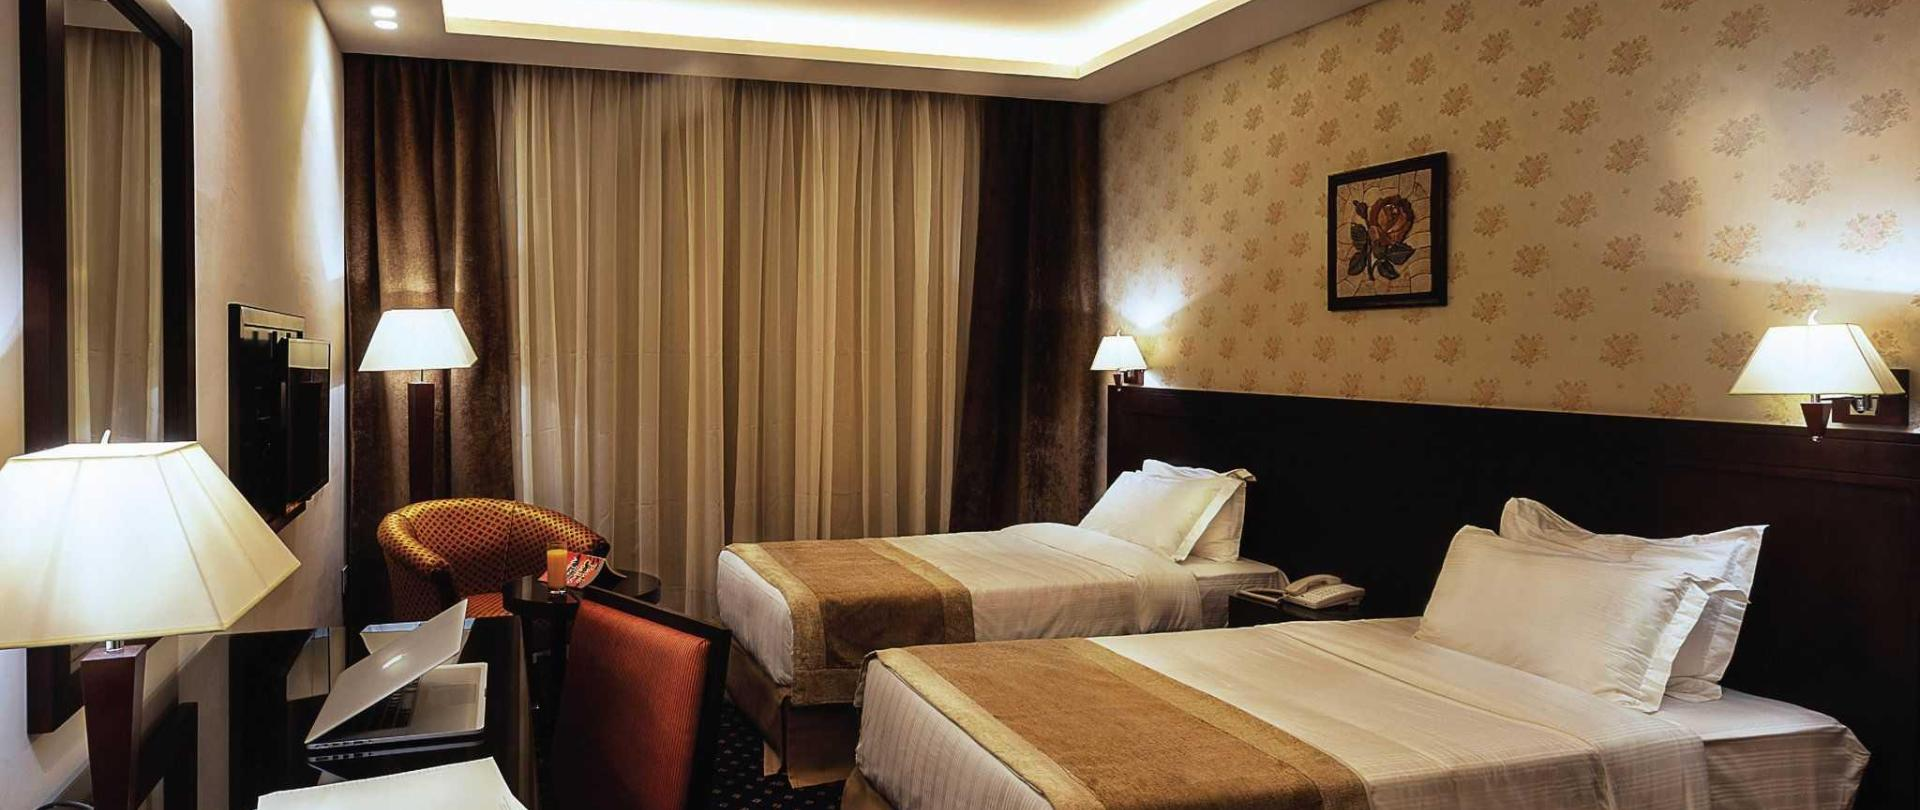 seven-roses-rooms-10.jpg